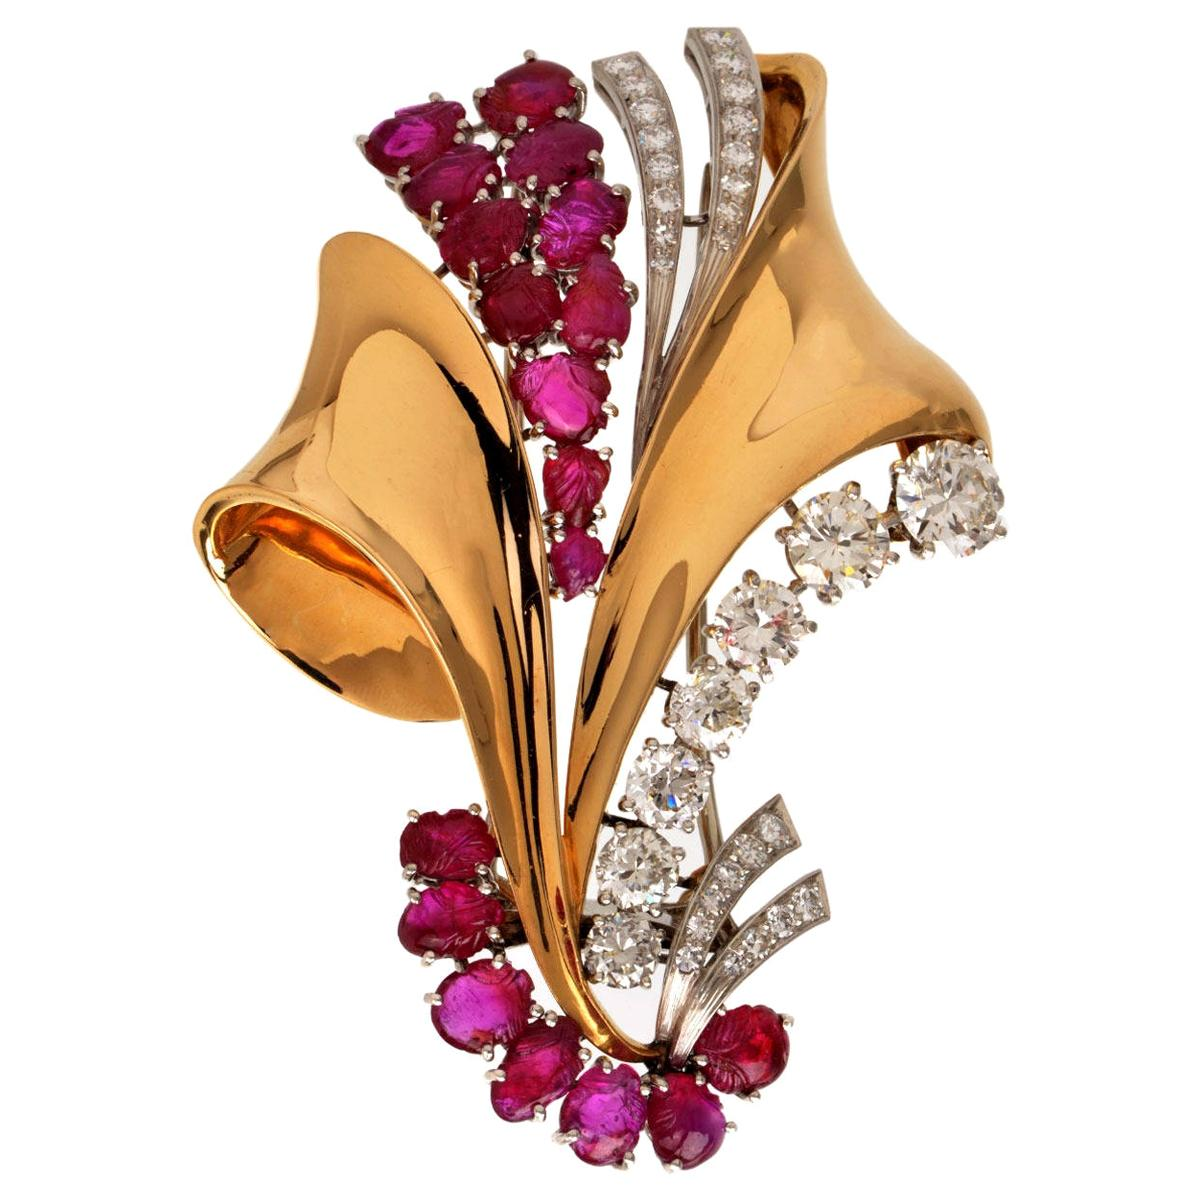 1970s Large Ruby Diamond 18 Karat Gold Pin Brooch